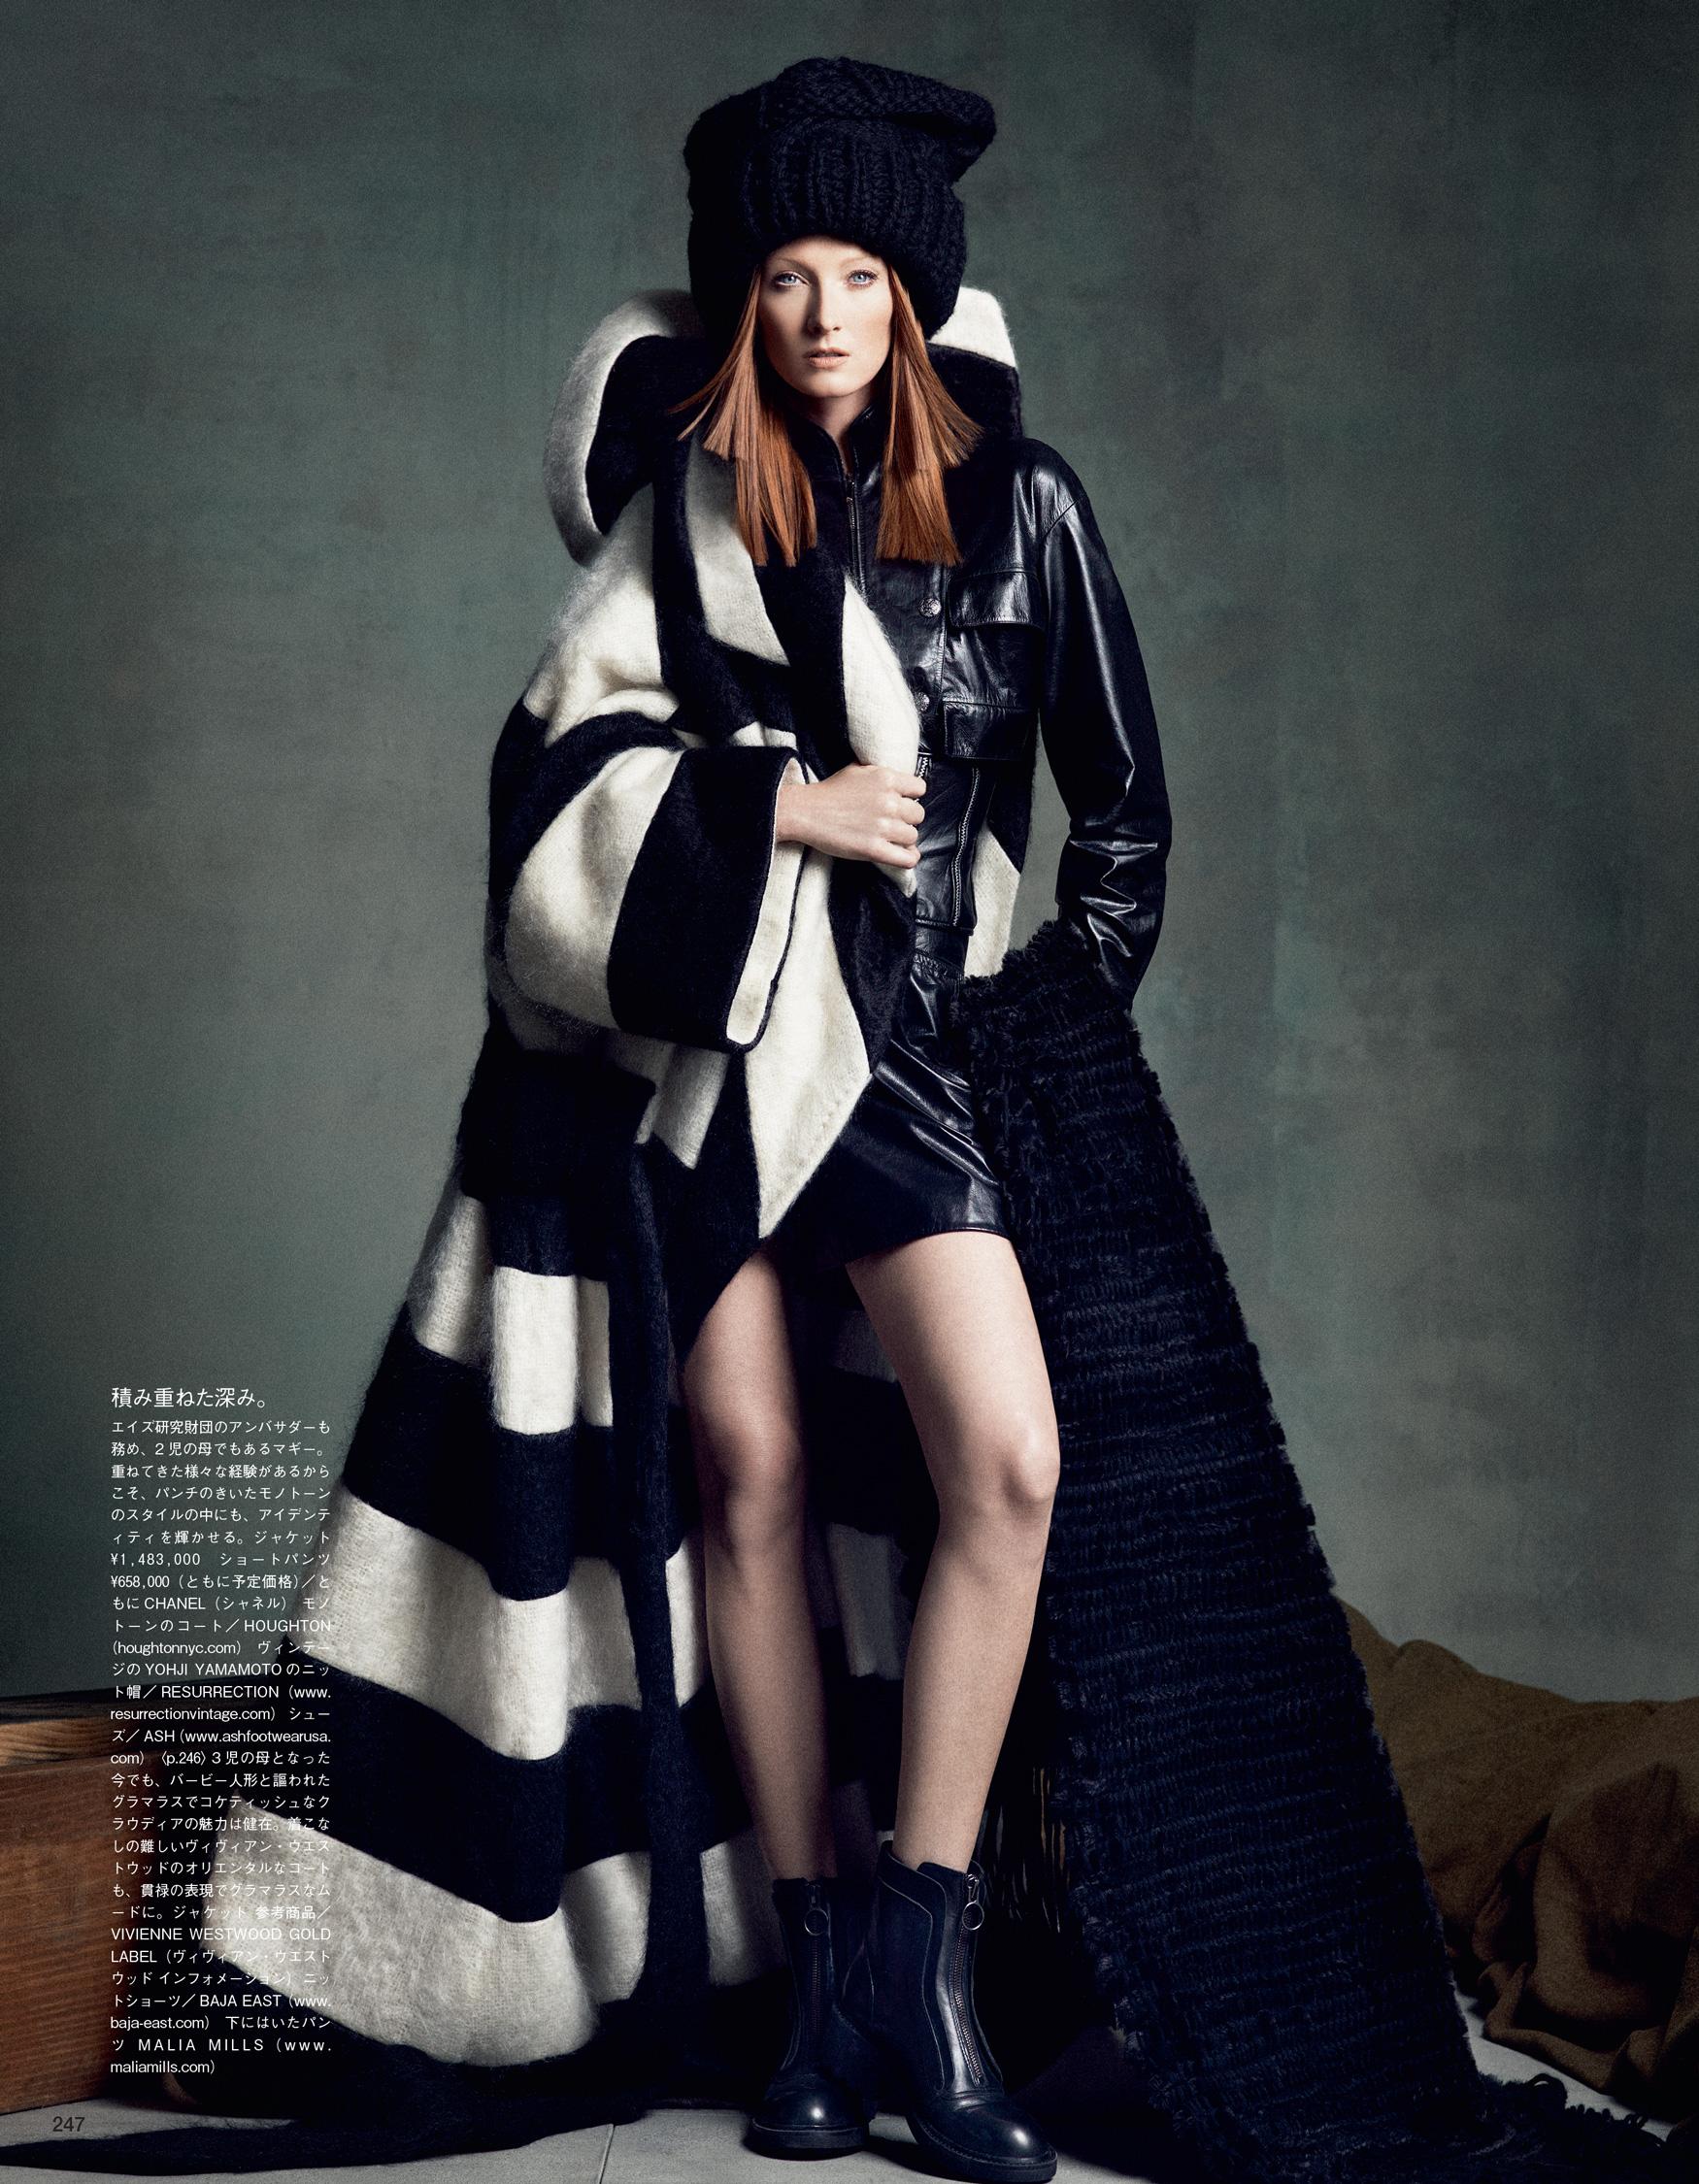 Giovanna-Battaglia-The-Icons-Of-Perfections-Vogue-Japan-15th-Anniversary-Issue-Luigi-Iango-V181_247_200-20.jpg